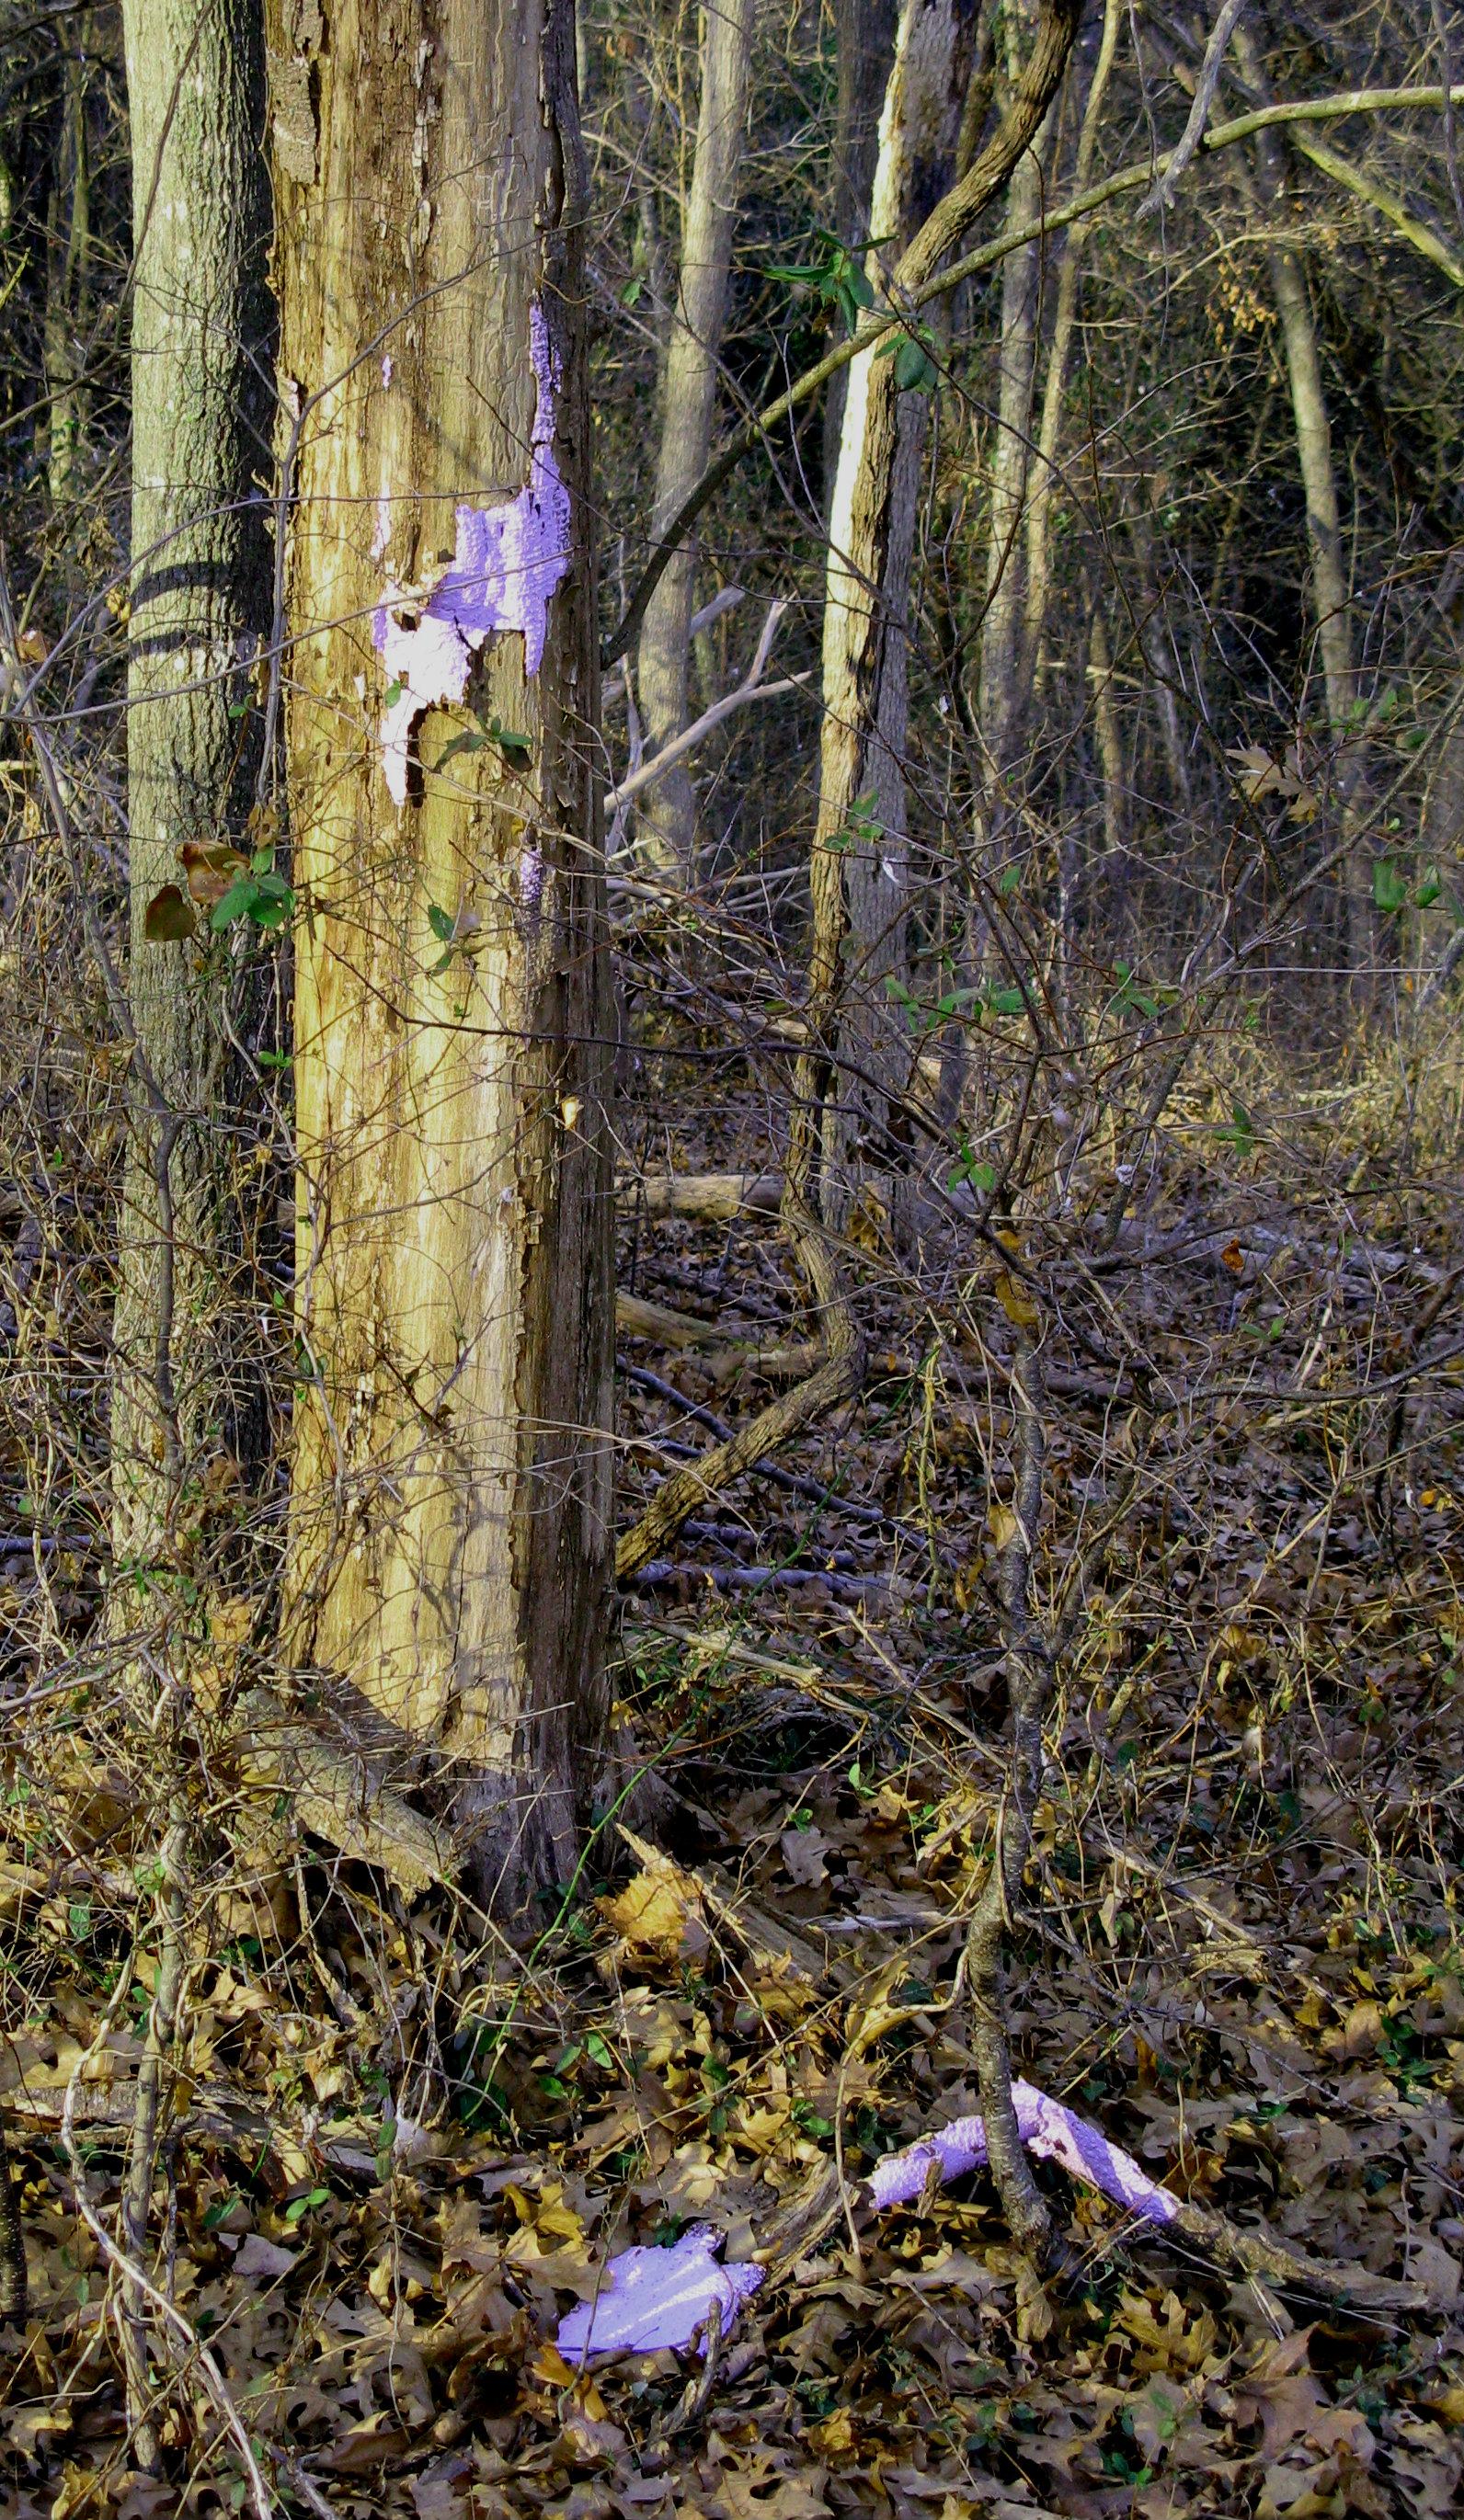 Purple paint on tree trunk